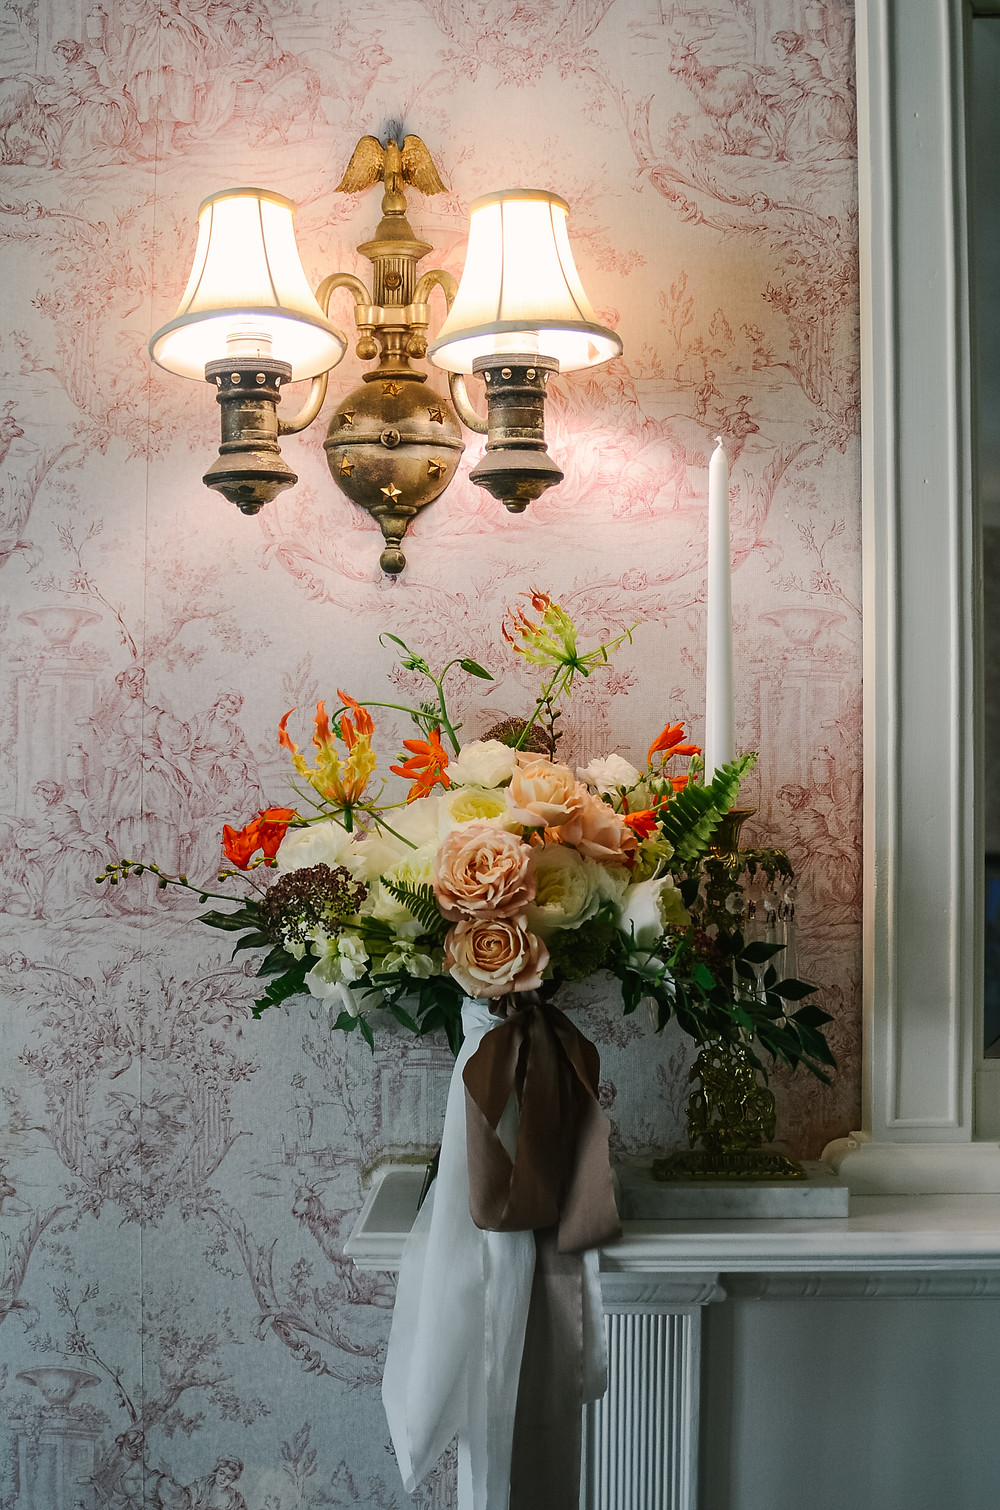 wedding venue Beaufort, wedding venue Charleston, wedding flowers, bouquet, bridal, bridal bouquet